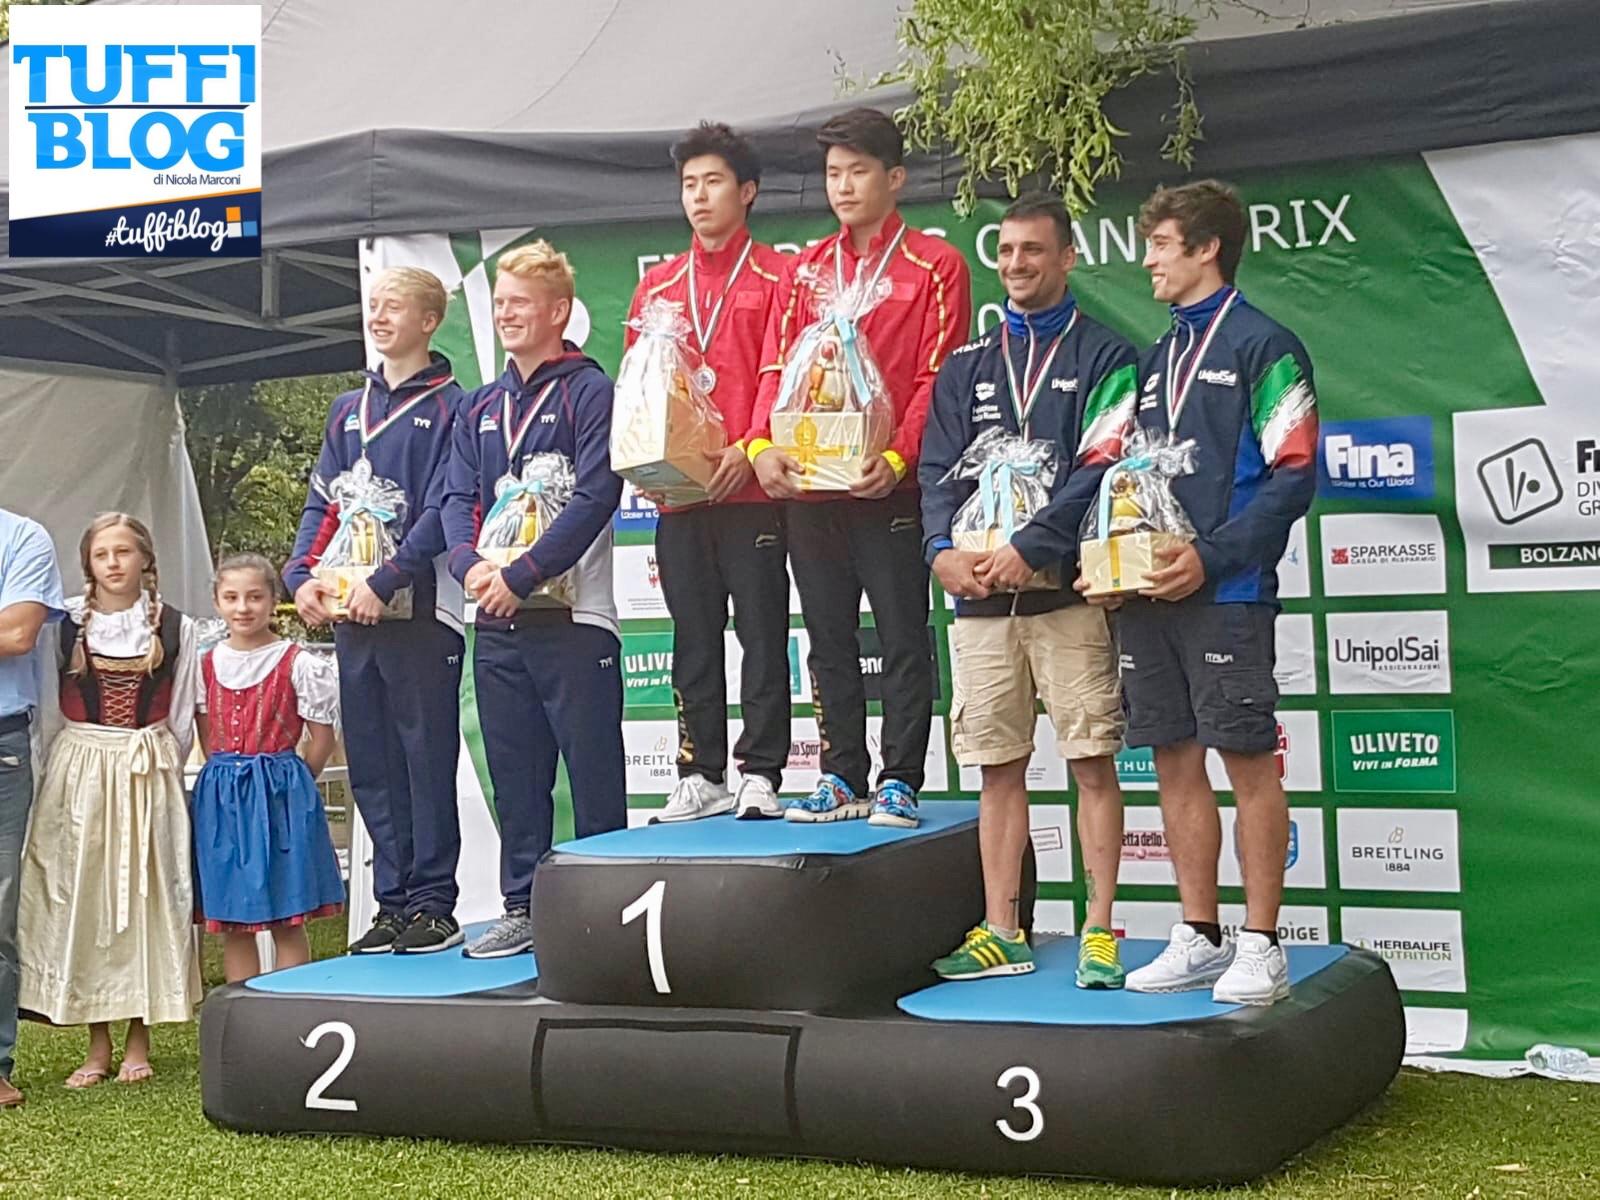 Fina GP: Bolzano - Arriva la 1ª medaglia azzurra!